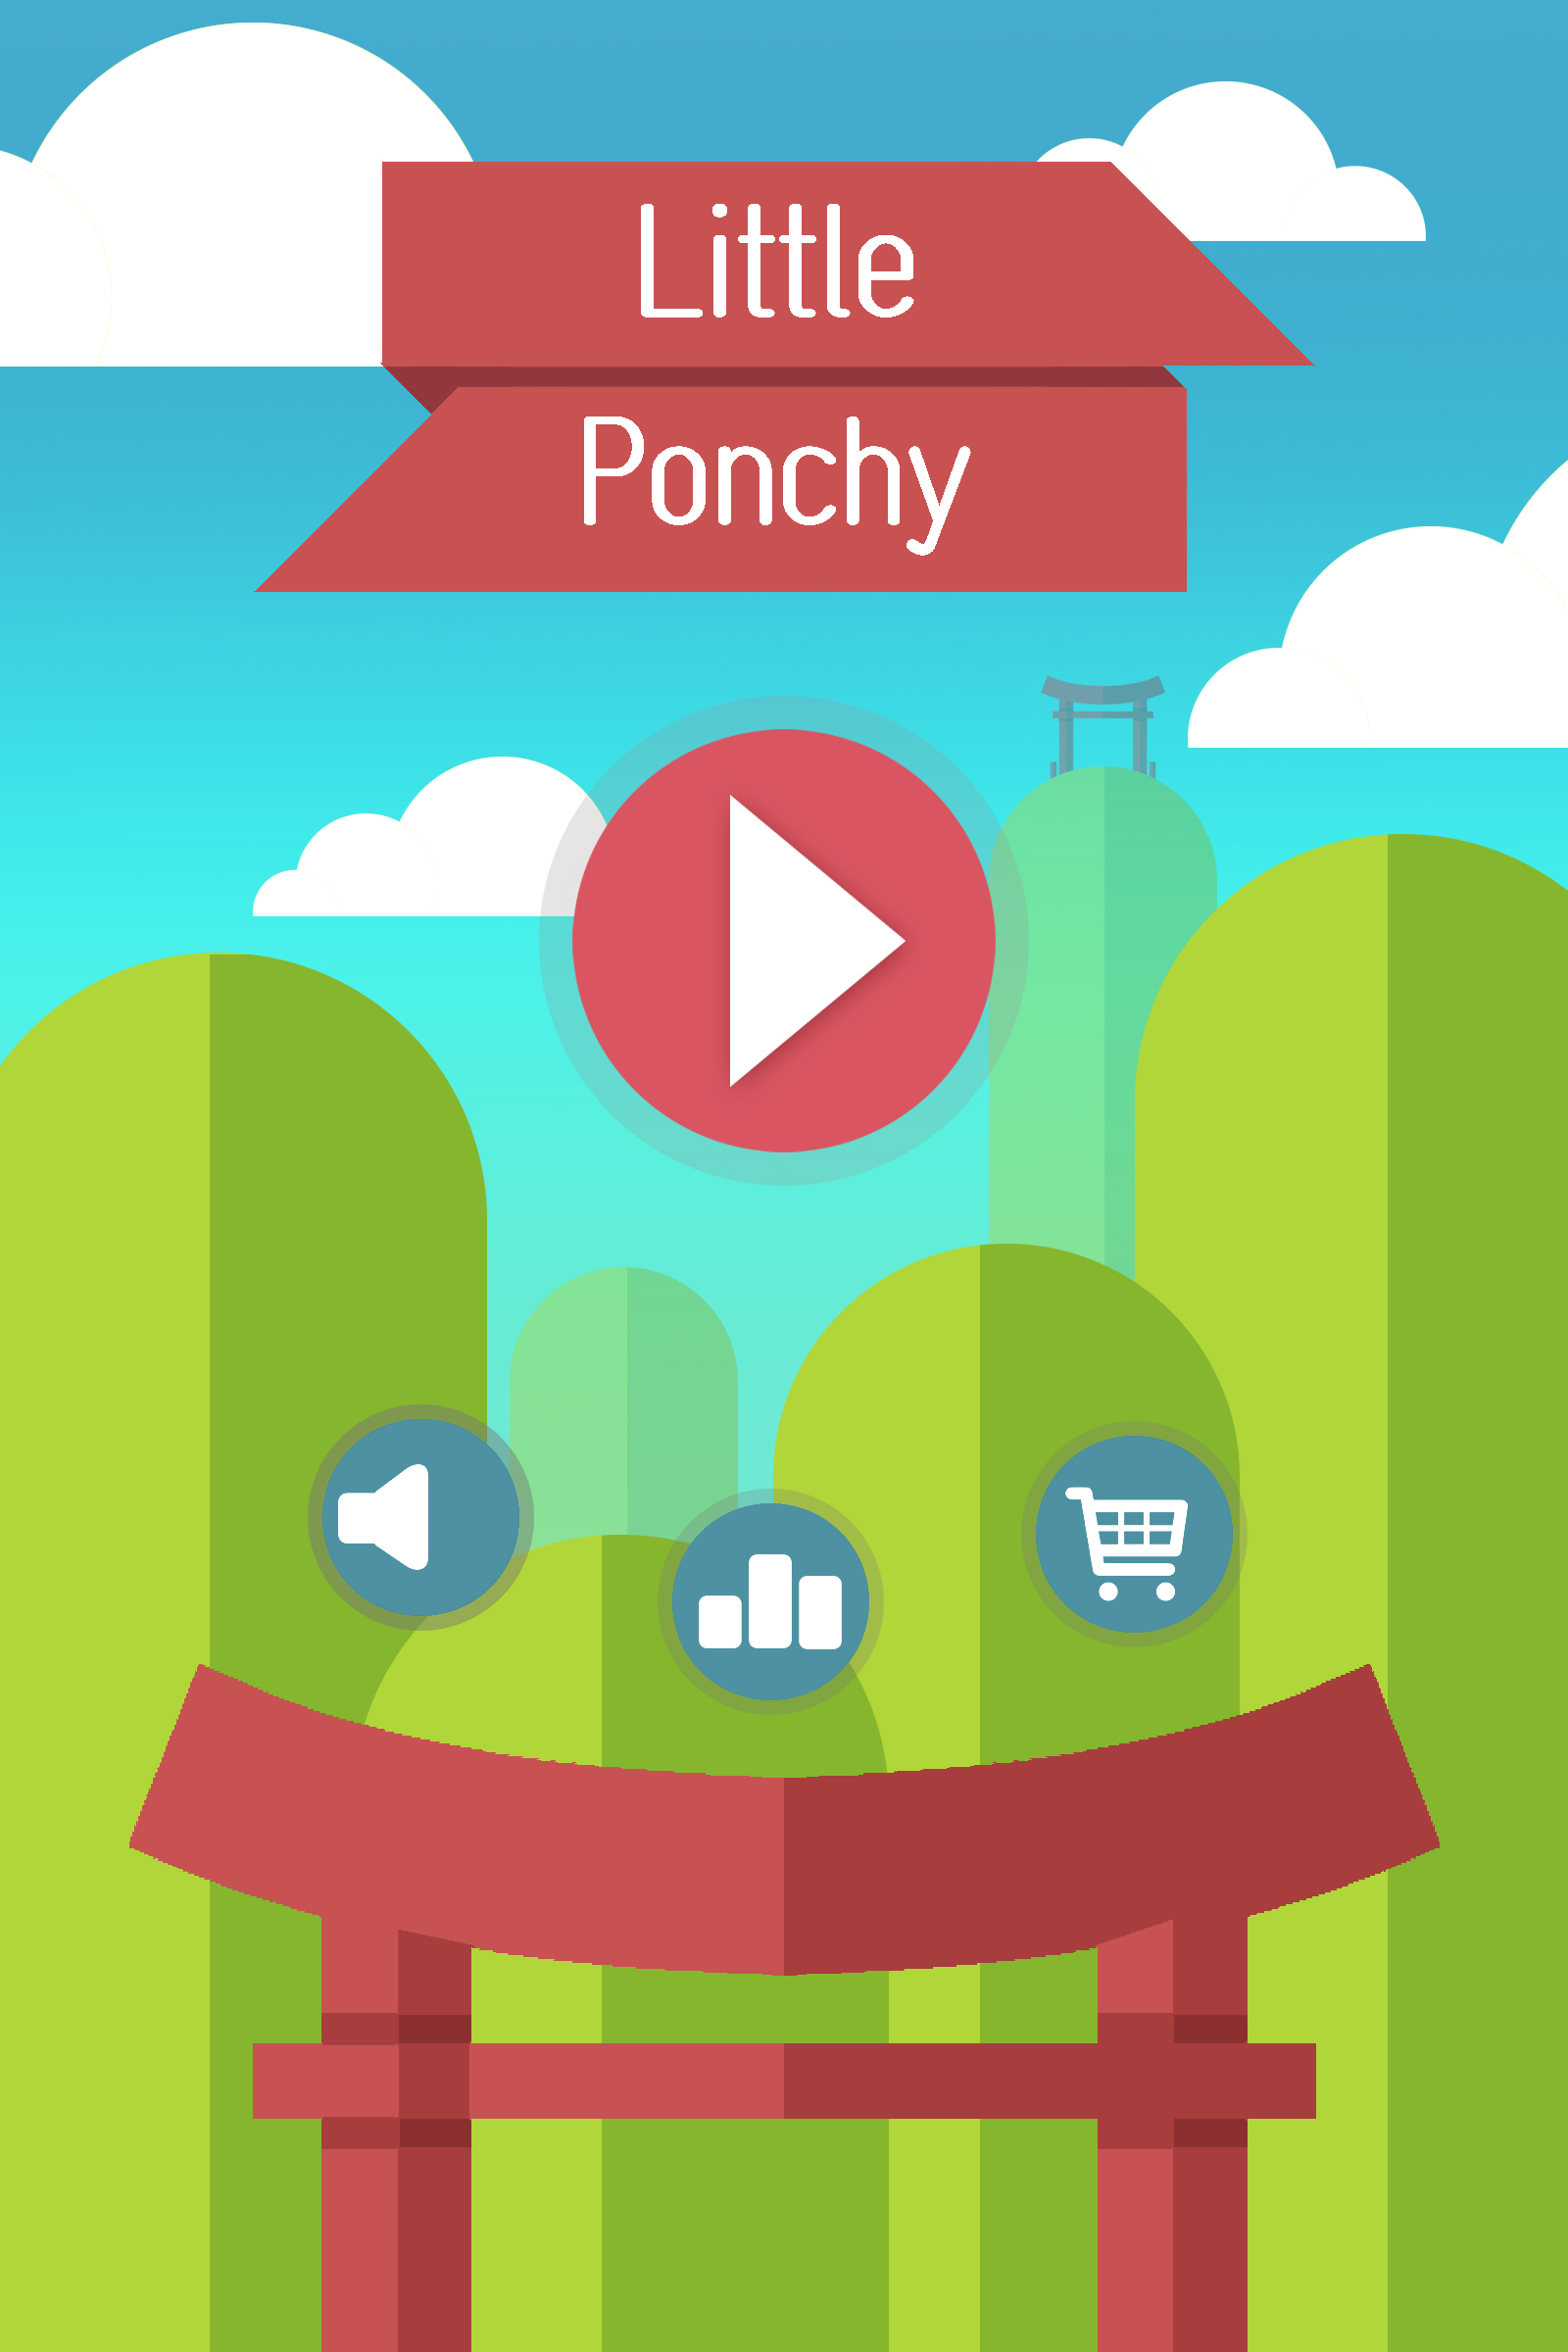 little ponchy